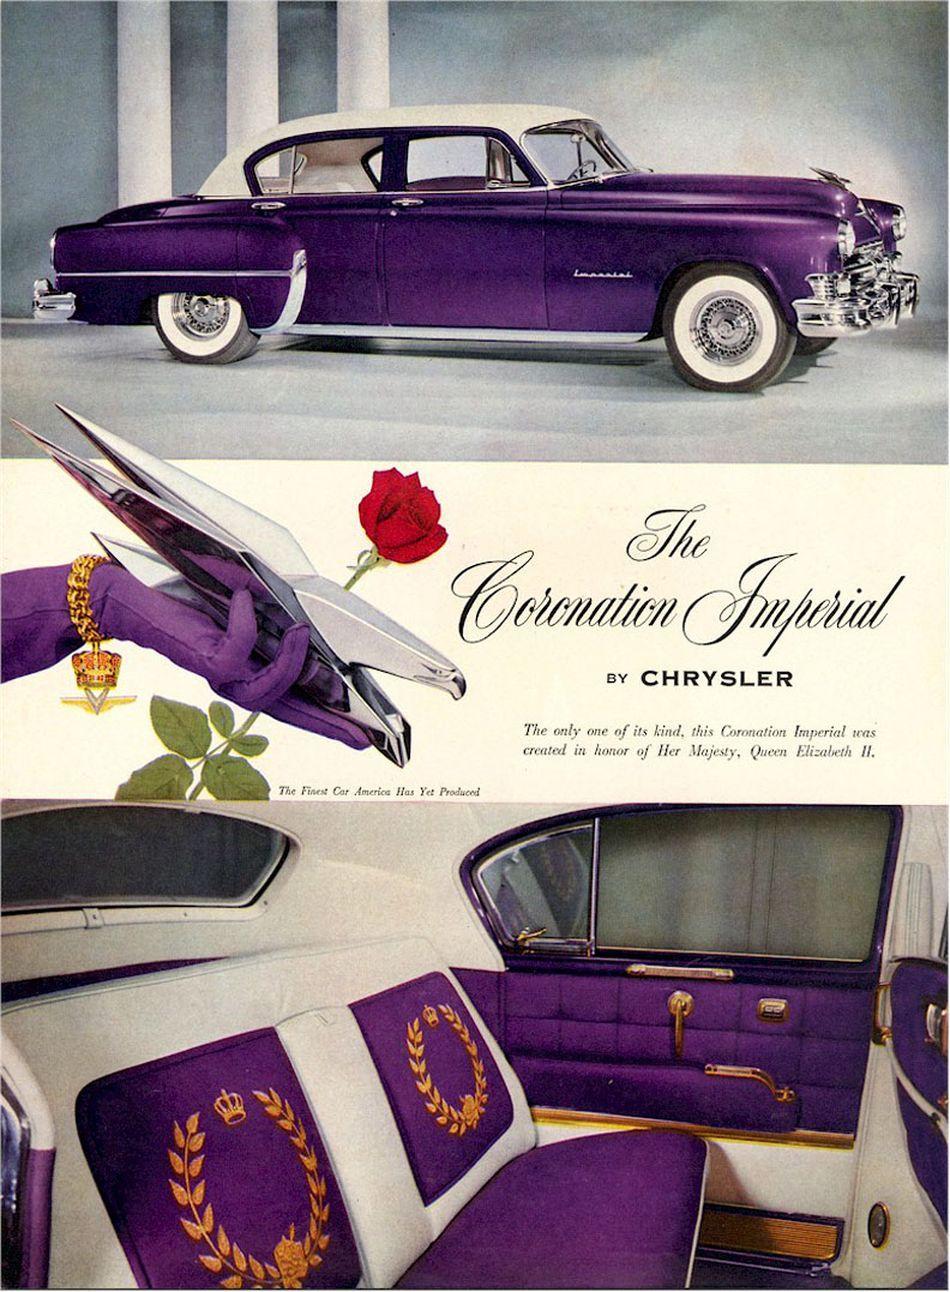 1953 Chrysler Coronation Imperial In Purple Purple Car Chrysler